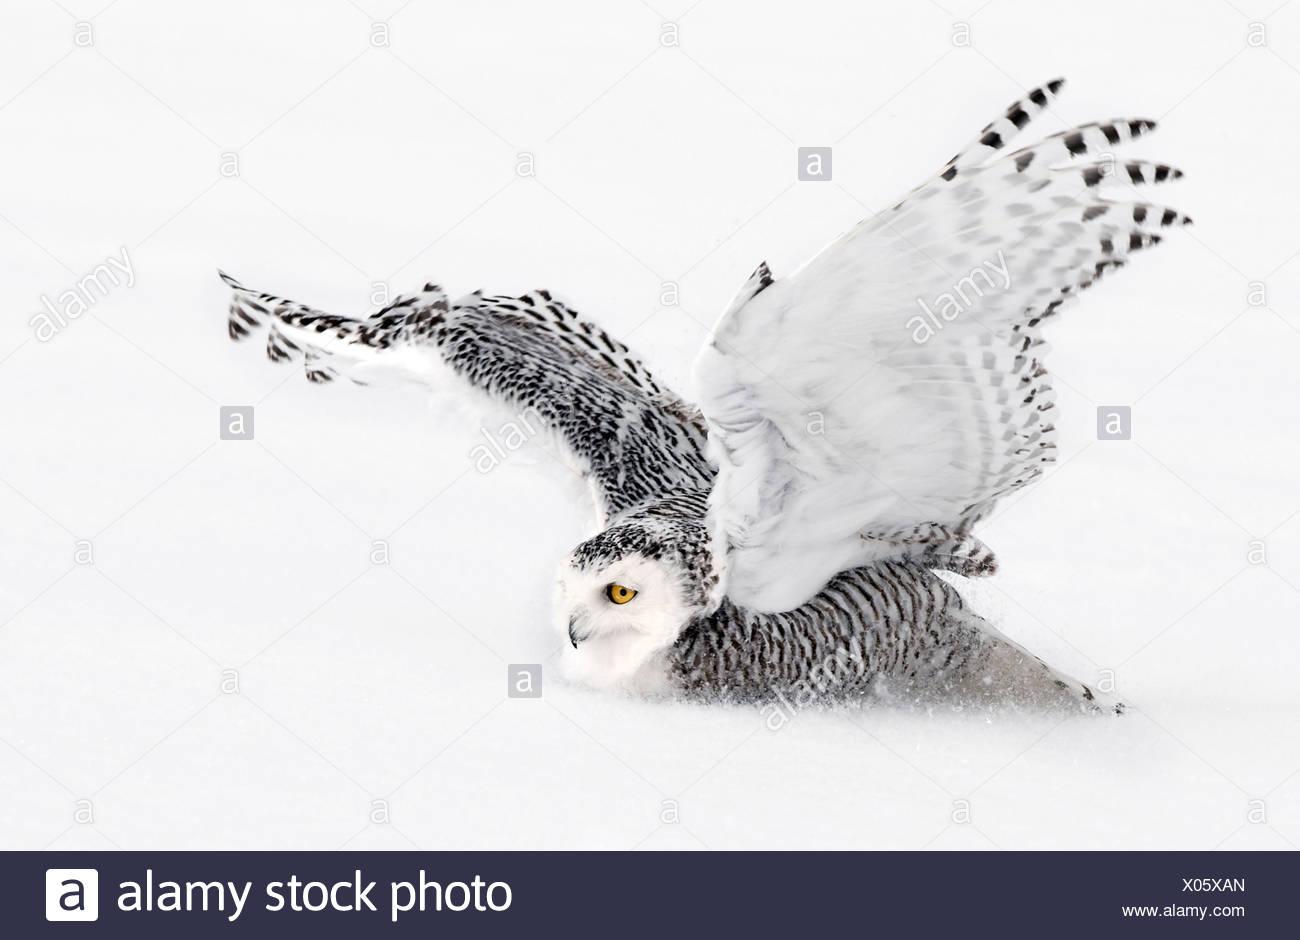 Snowy Owl landing, Ottawa, Canada - Stock Image